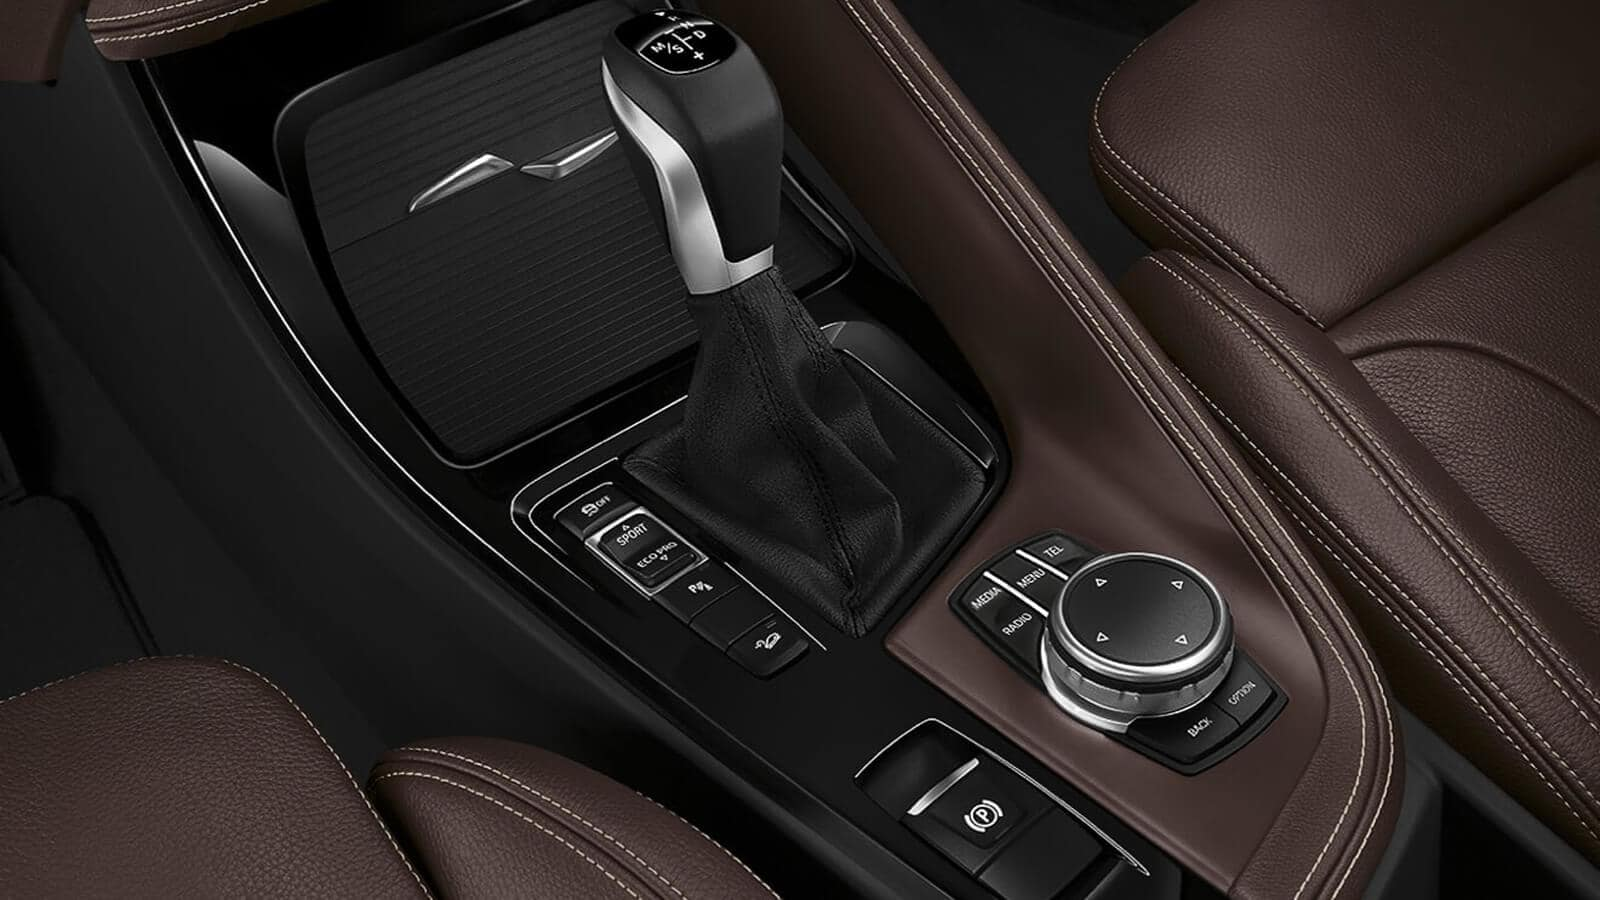 2019 BMW X1 Shift Knob